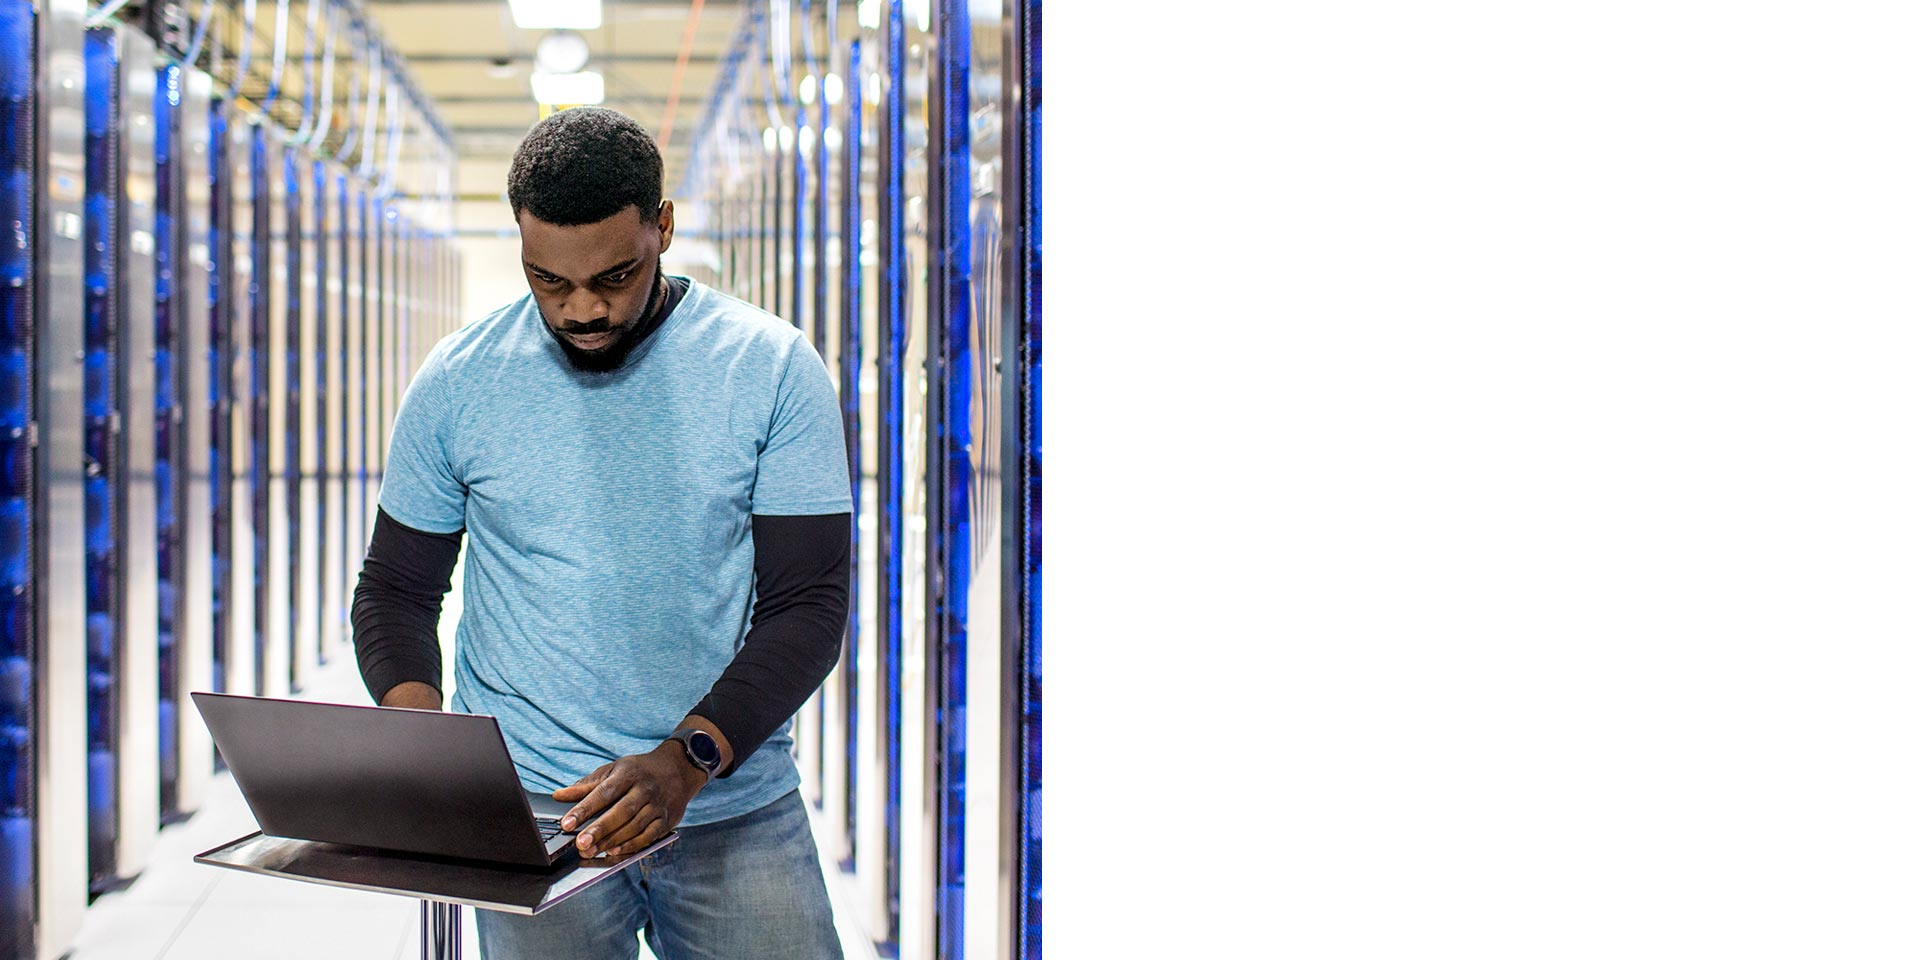 Man using laptop in data center